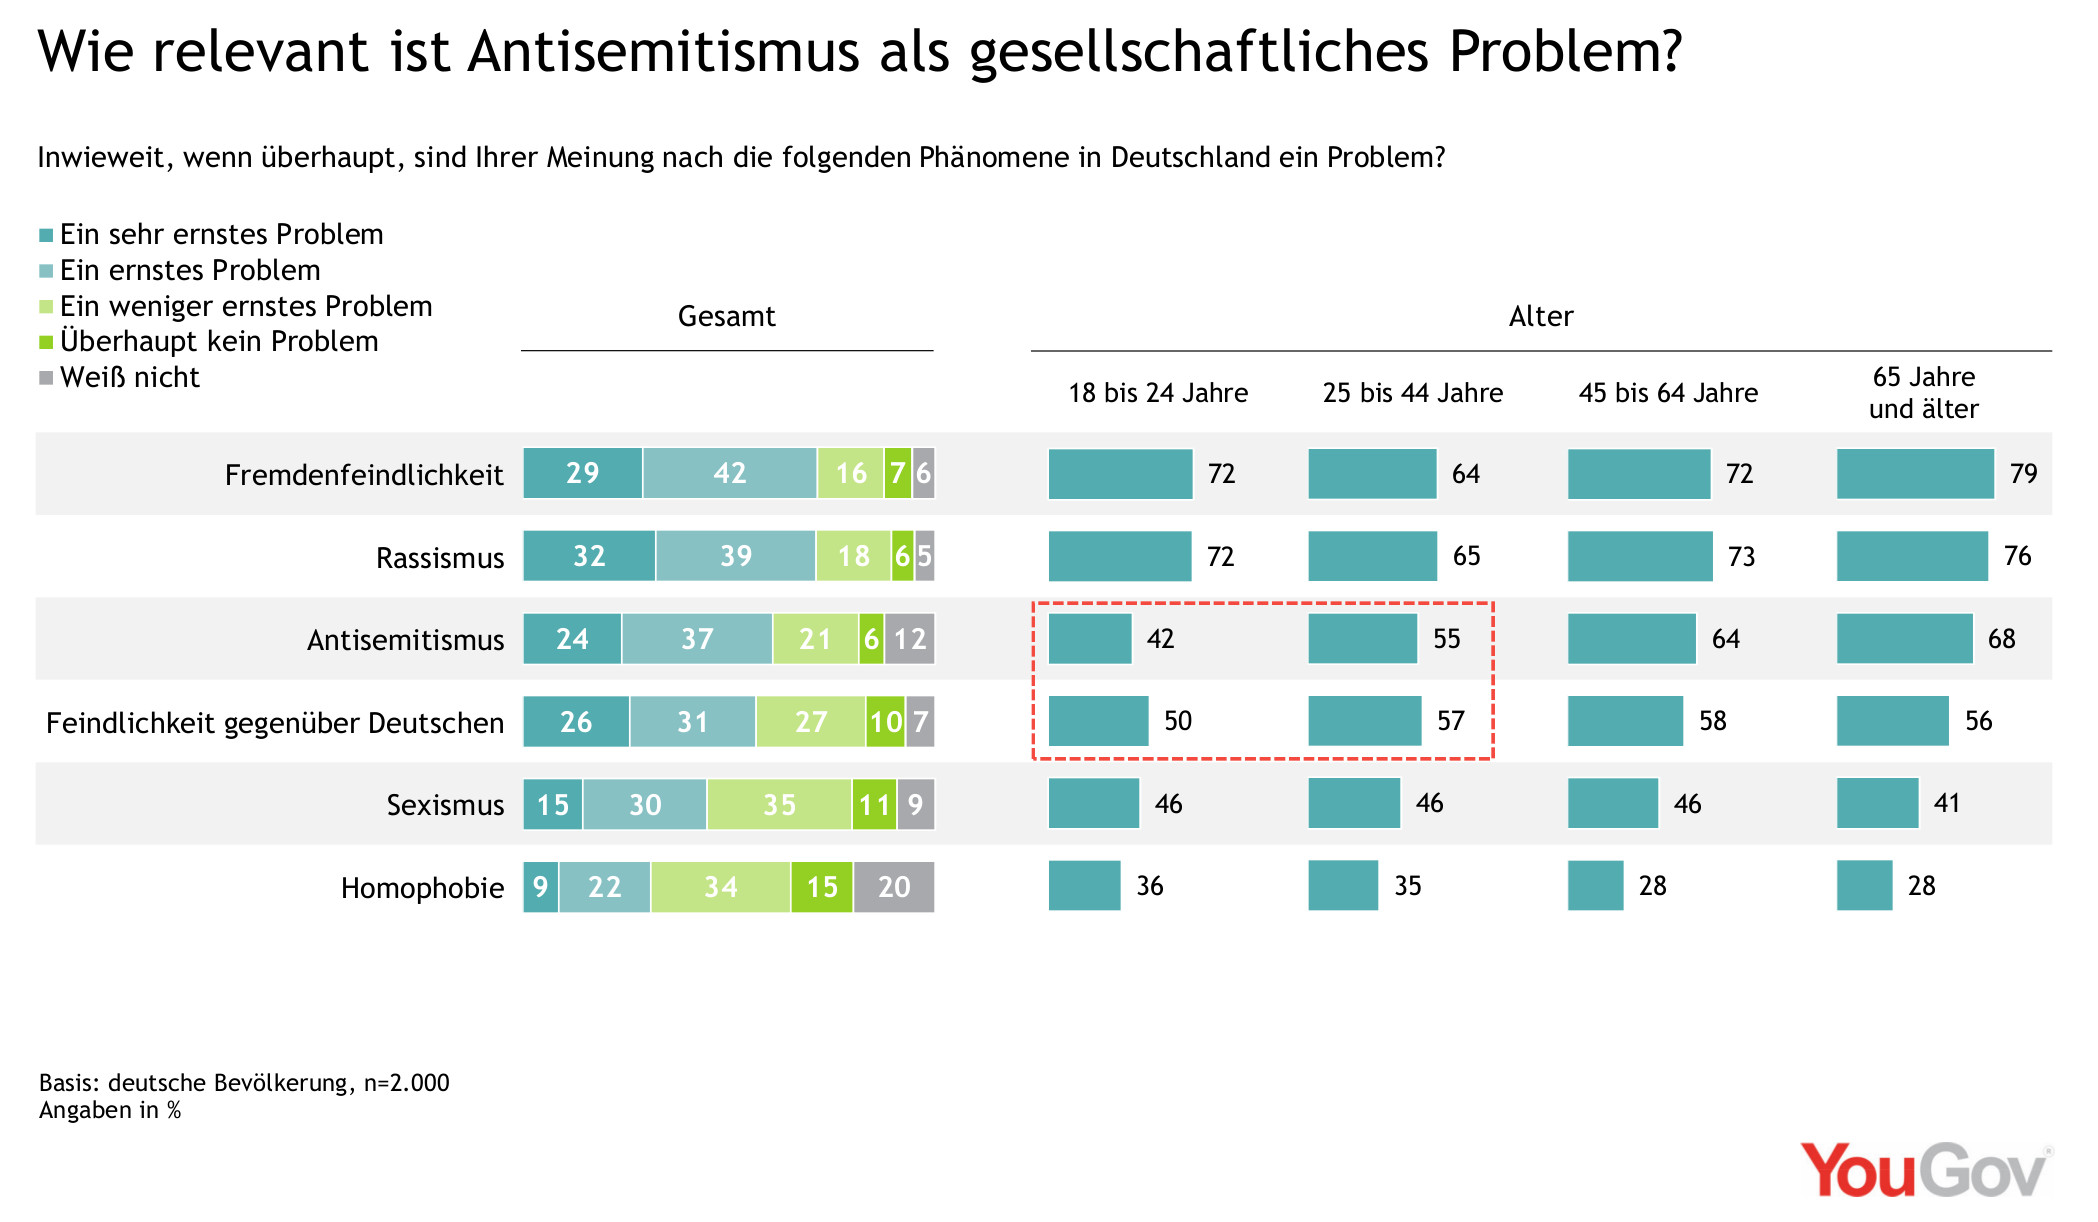 Wie relevant ist Antisemitismus?